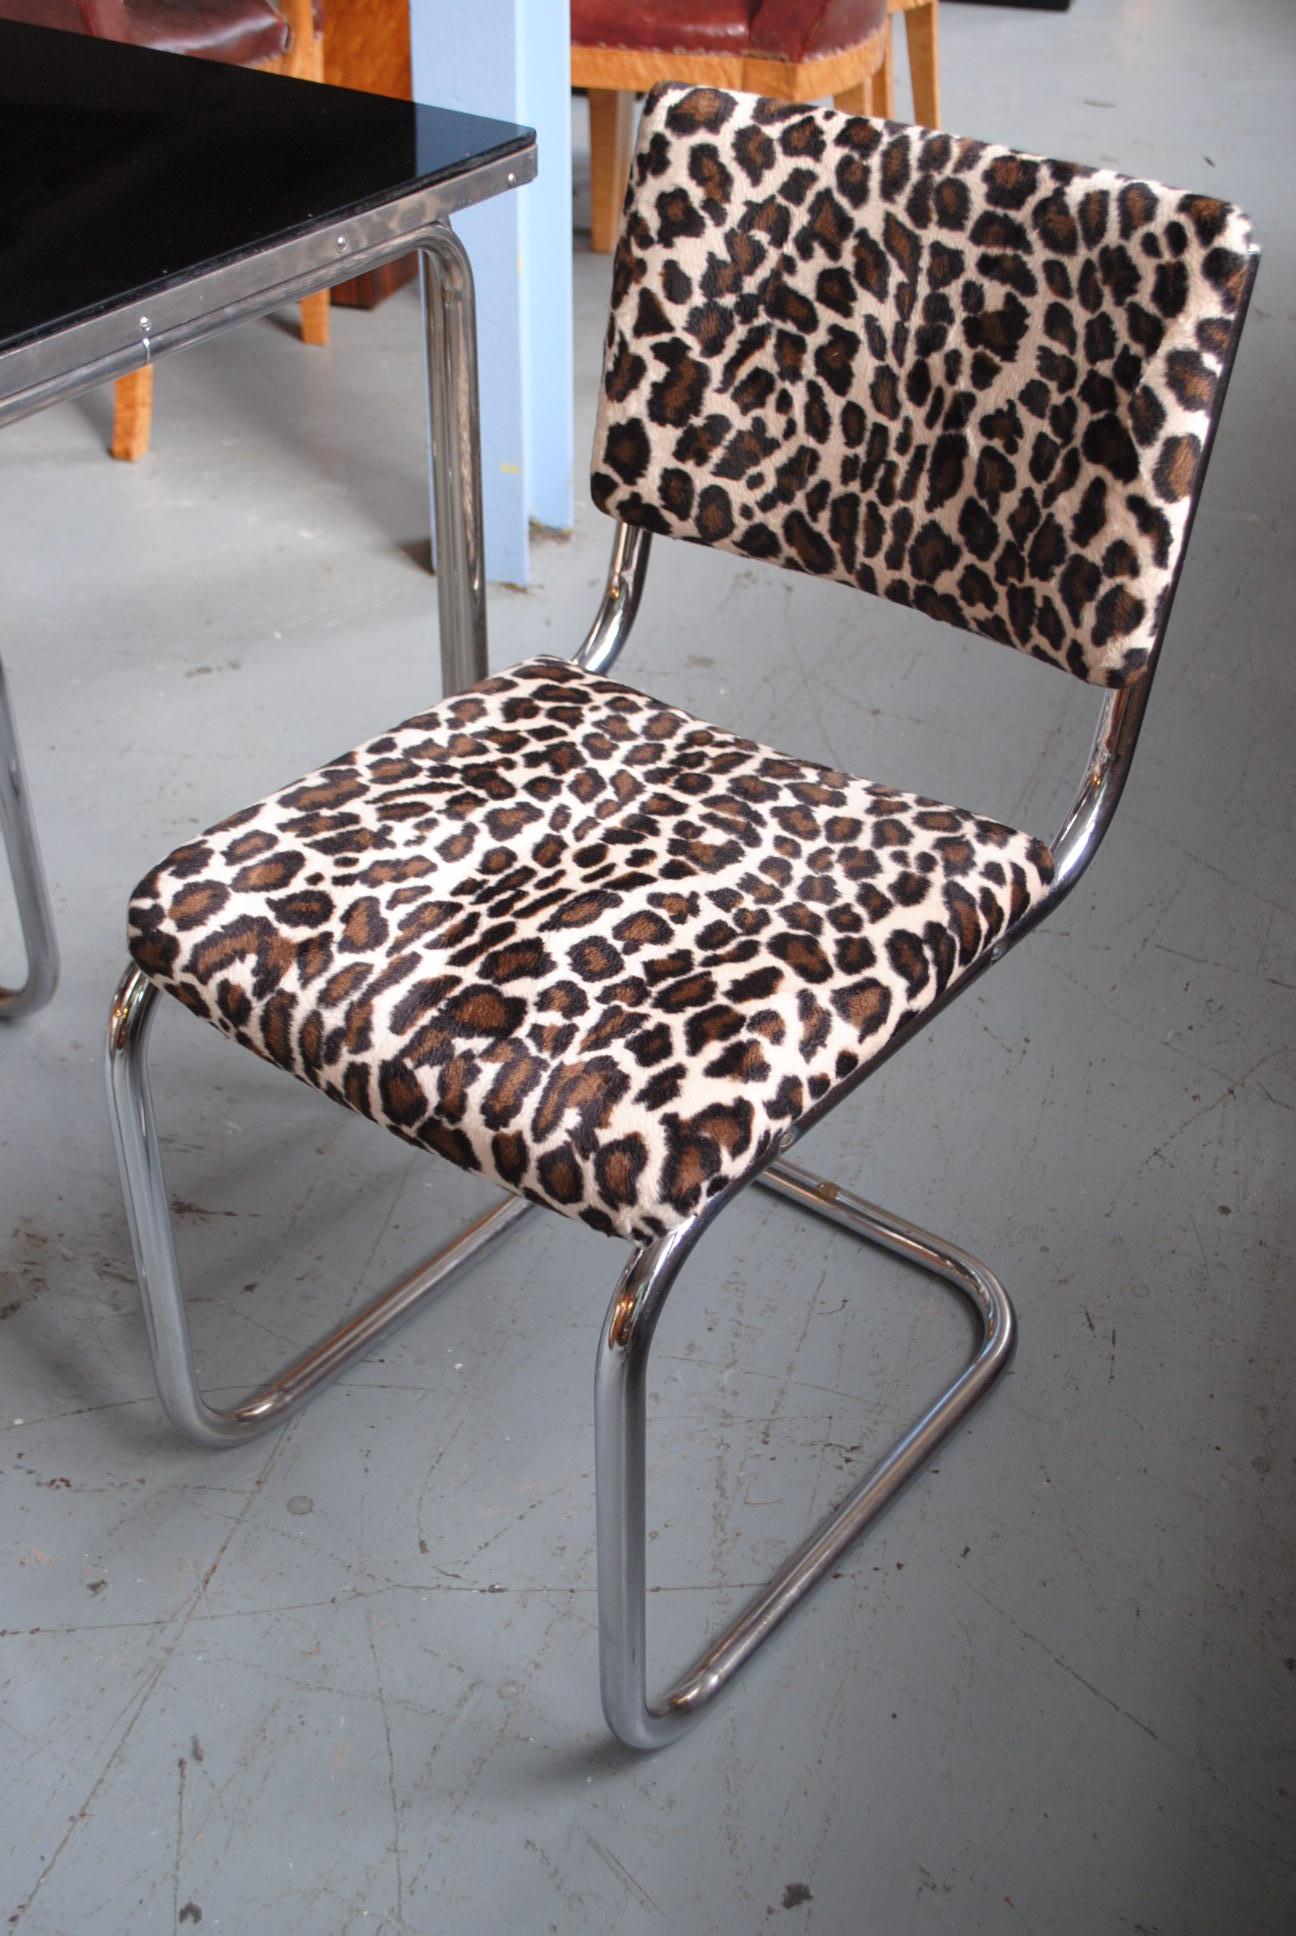 Original Art Deco Pel Chairs From The Rex Cinema 1936